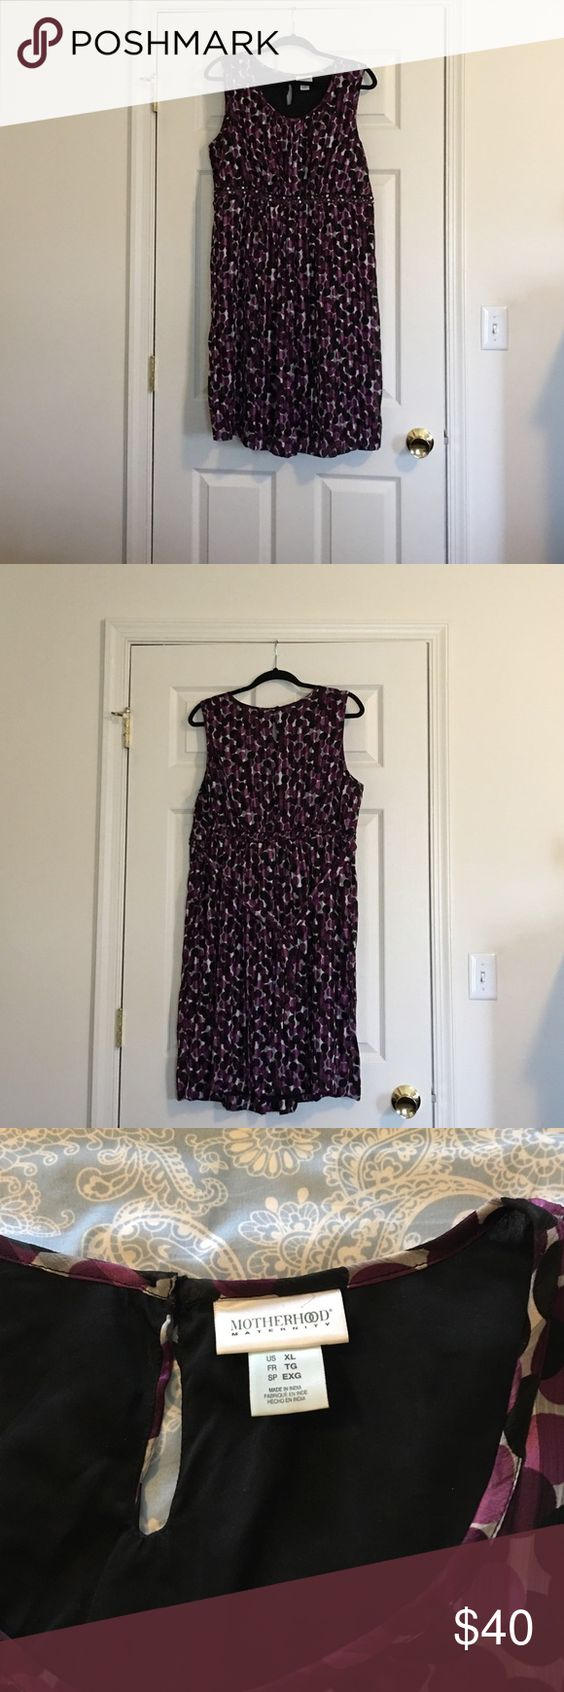 Maternity Purple Polka Dot Party Dress Sleeveless Purple Polka Dot Maternity Party Dress Motherhood Maternity Dresses